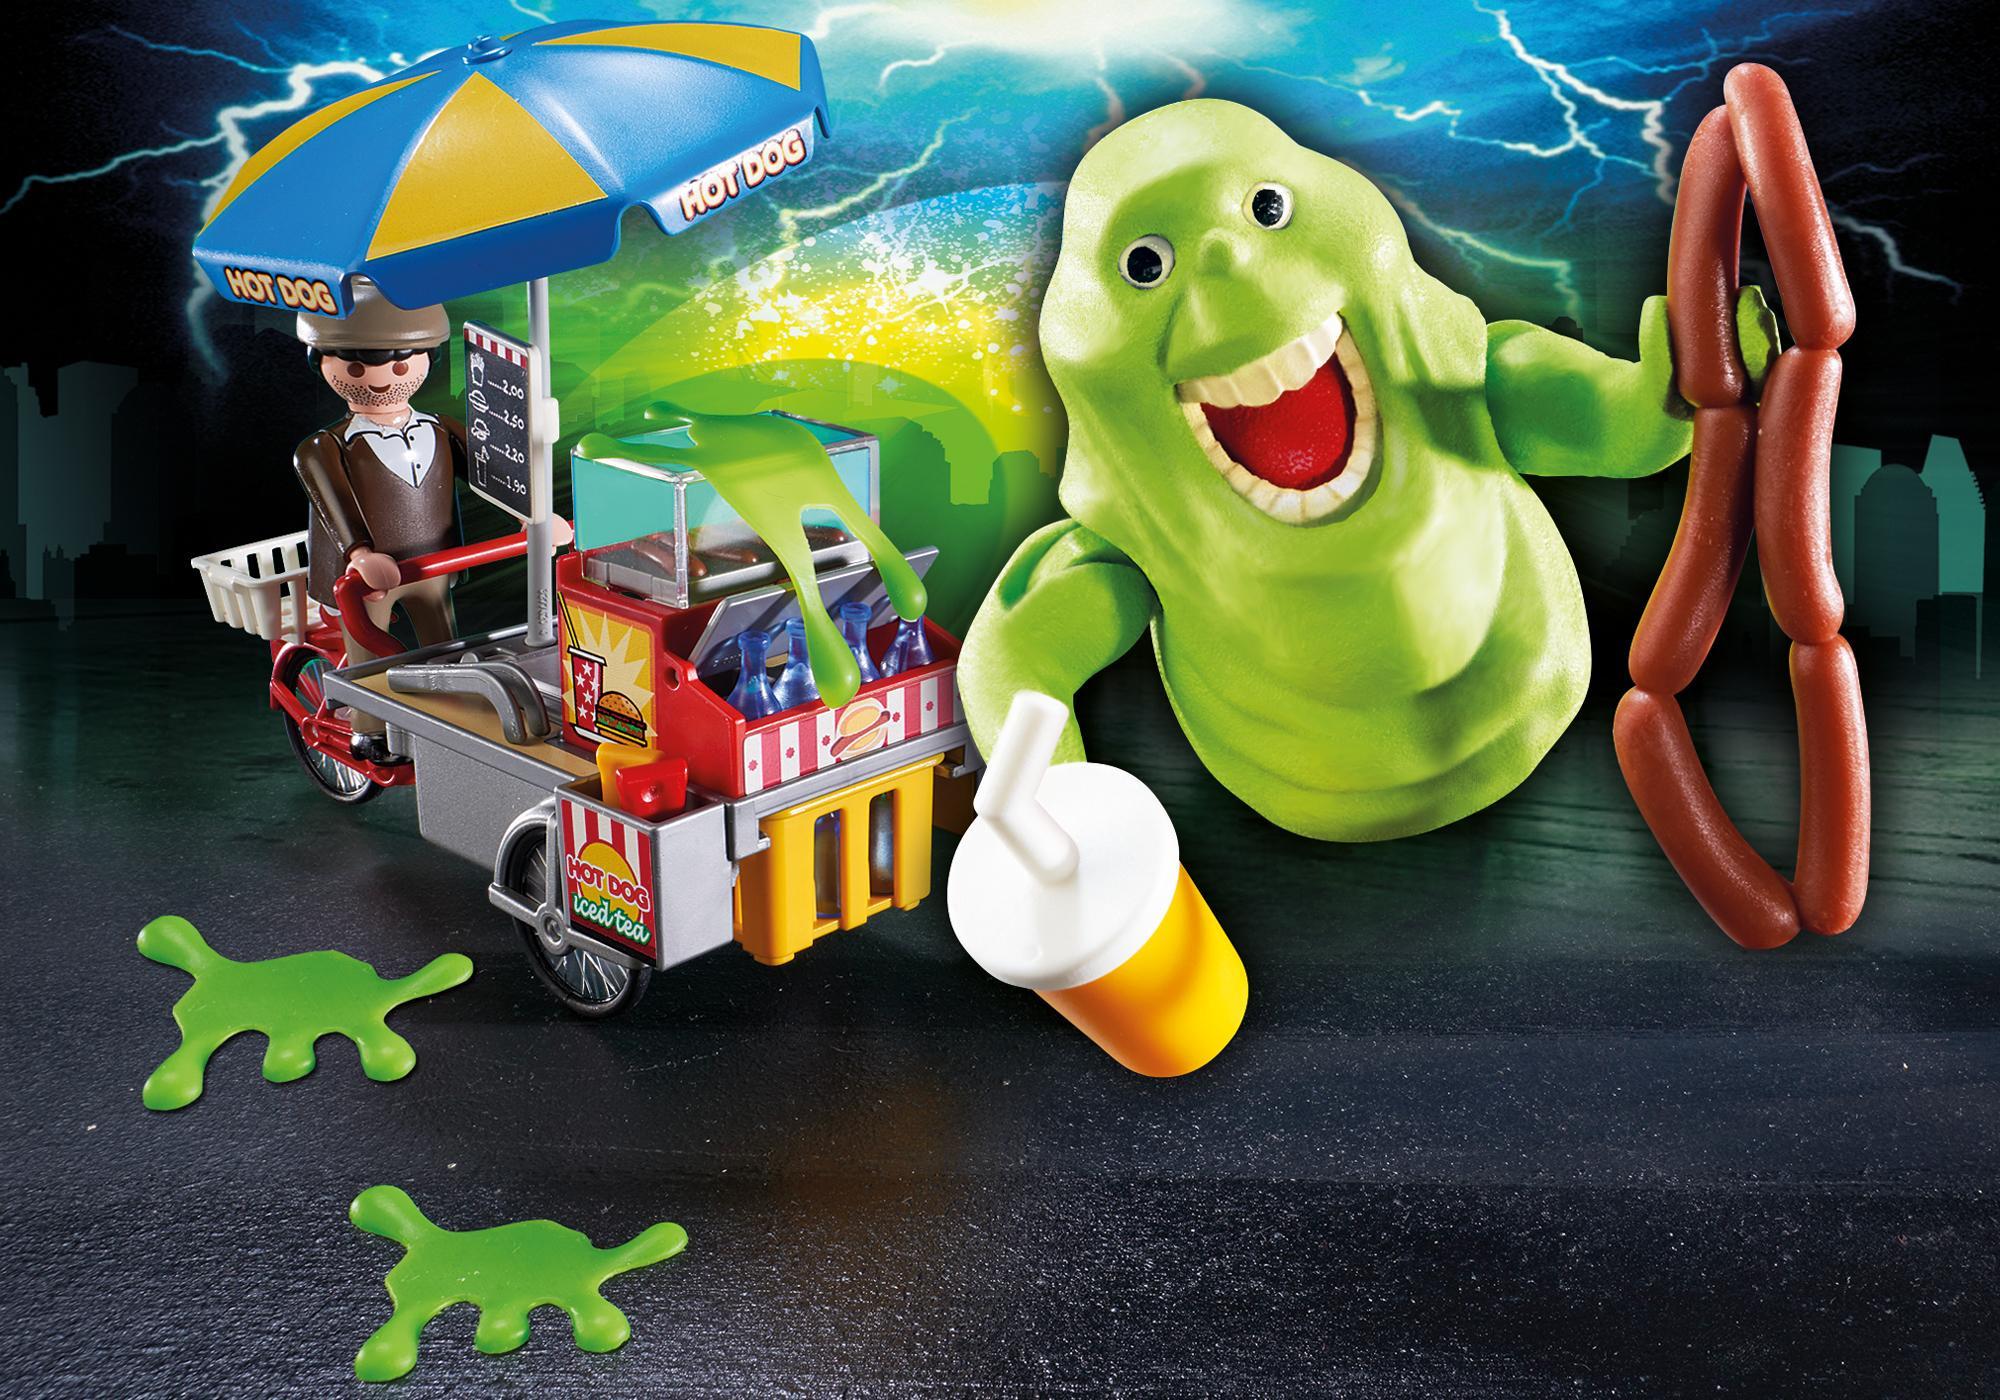 http://media.playmobil.com/i/playmobil/9222_product_extra1/Slimer en hotdogkraam